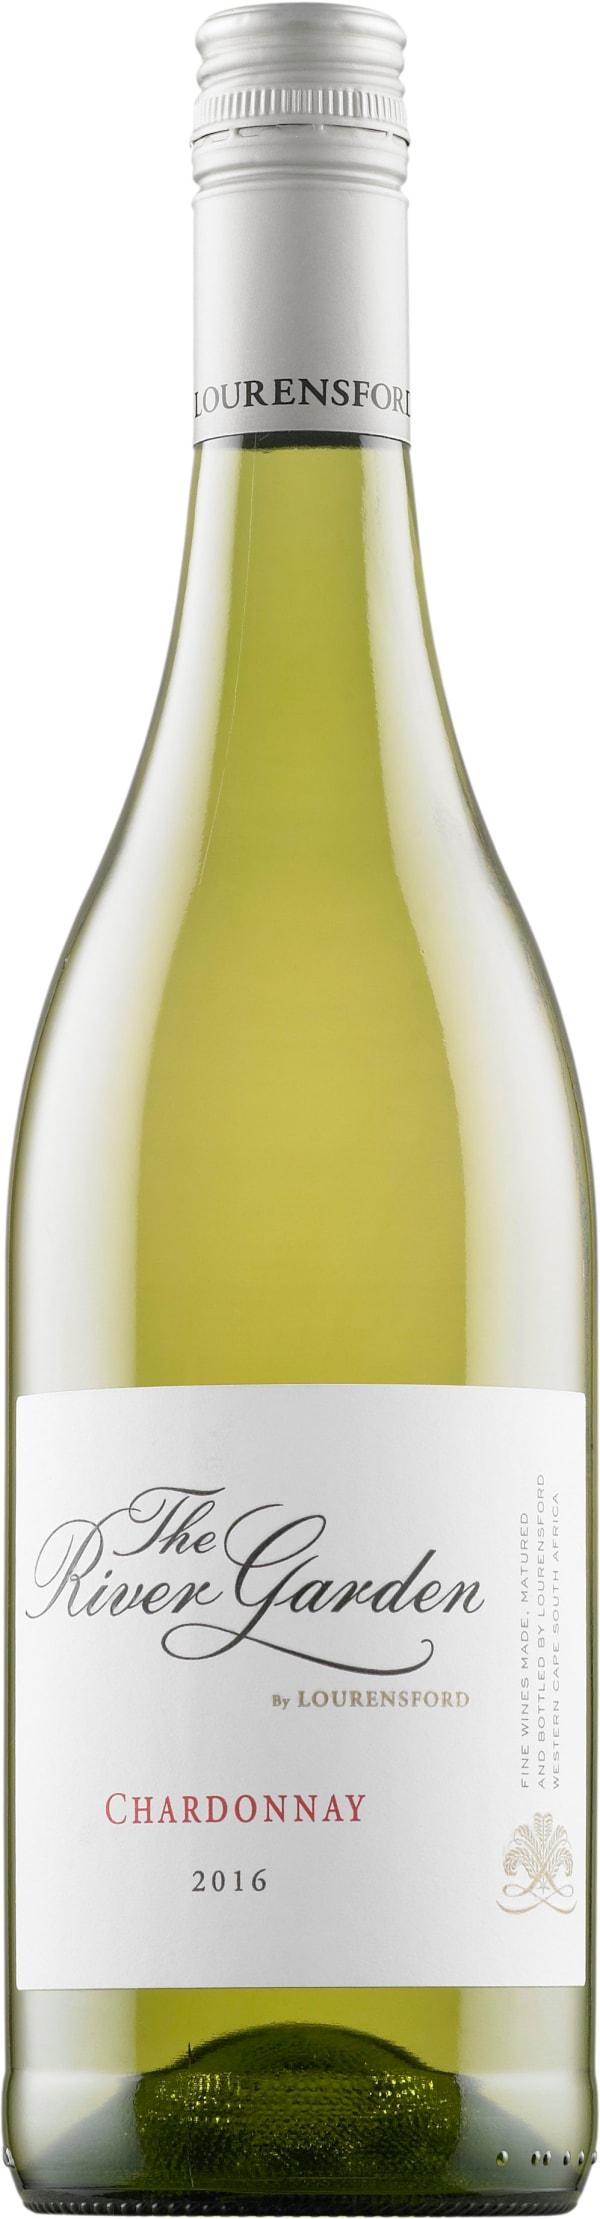 The River Garden Chardonnay 2016